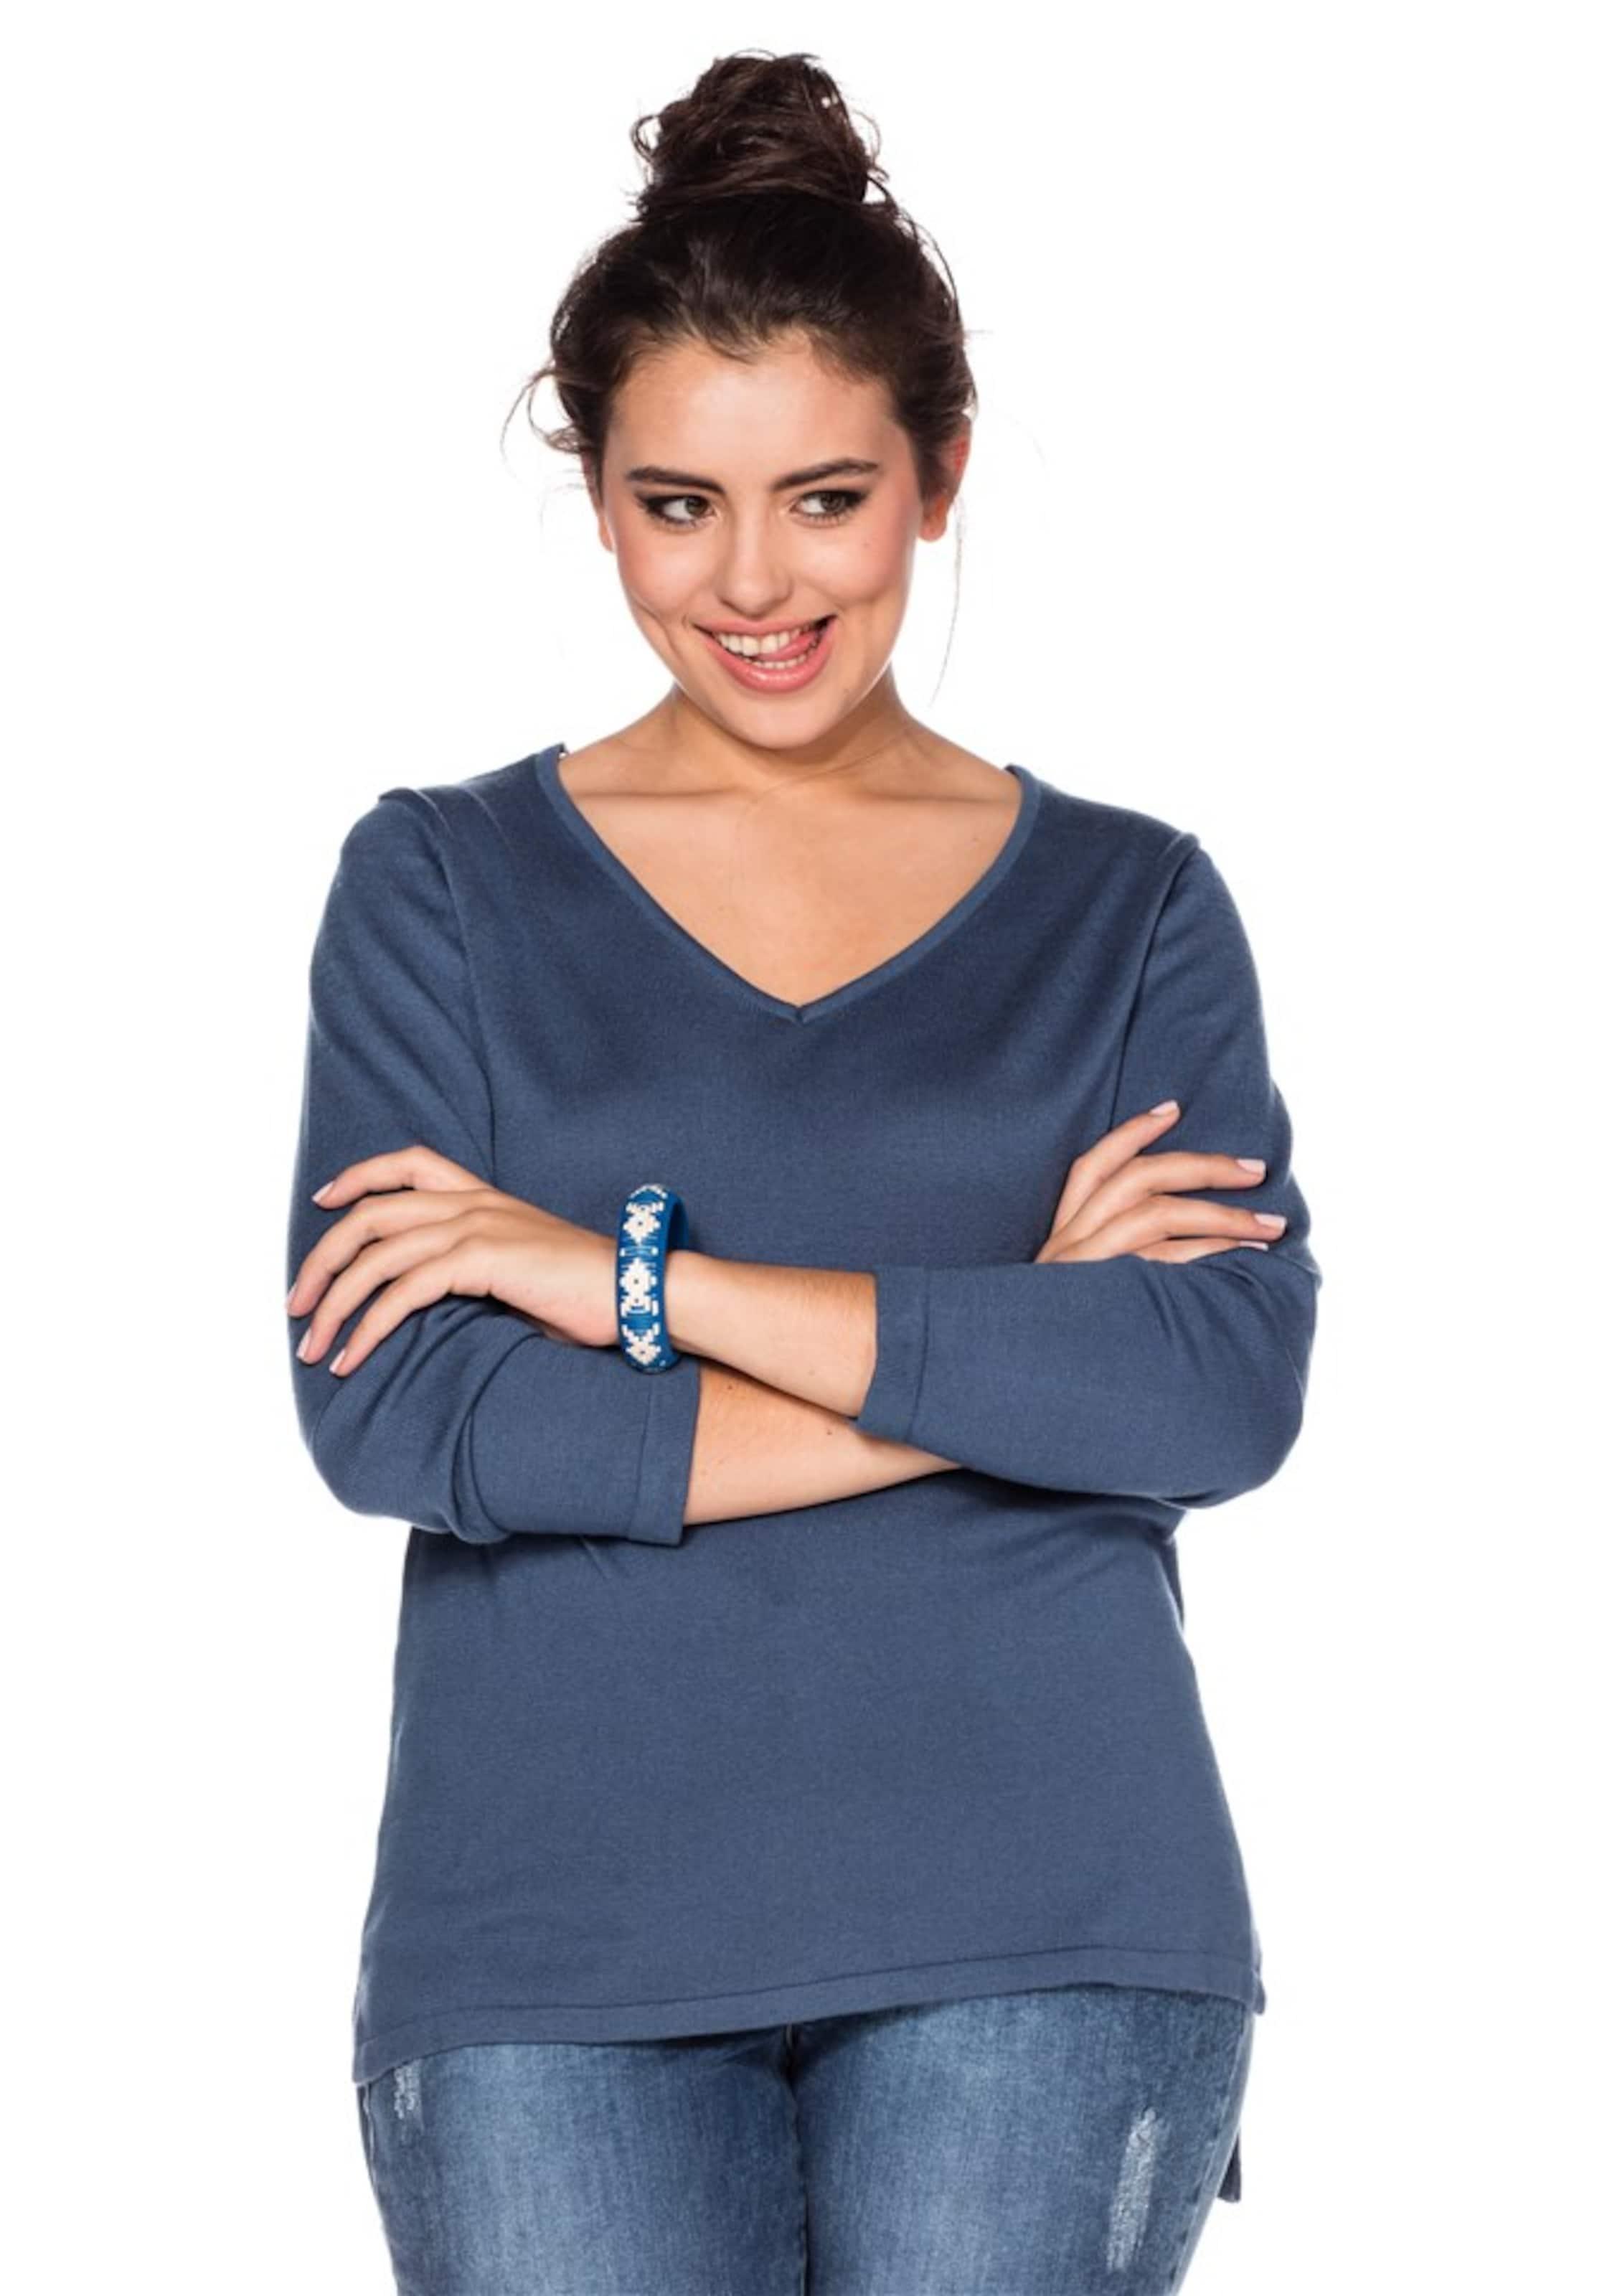 In Pullover Pullover Sheego Pullover In In In Sheego Blau Pullover Sheego Blau Blau Sheego wikXlOPZuT